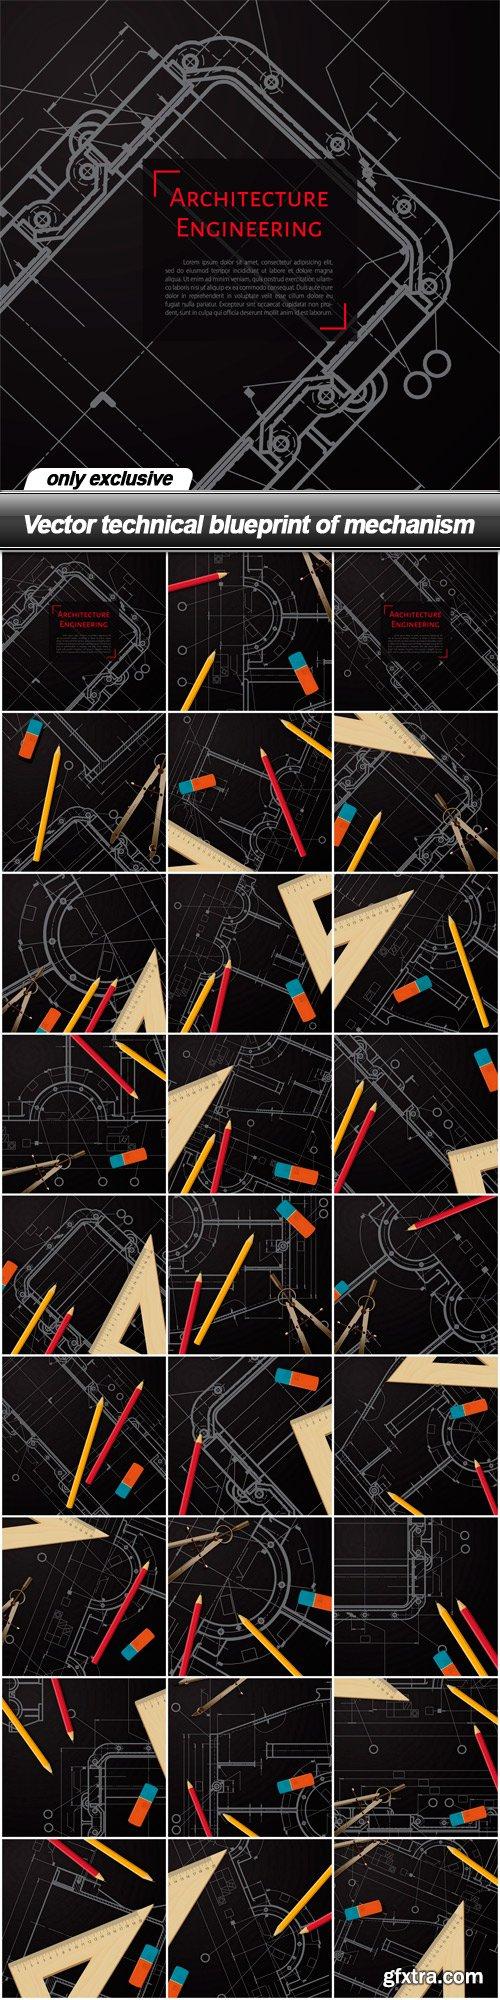 Vector technical blueprint of mechanism - 27 EPS